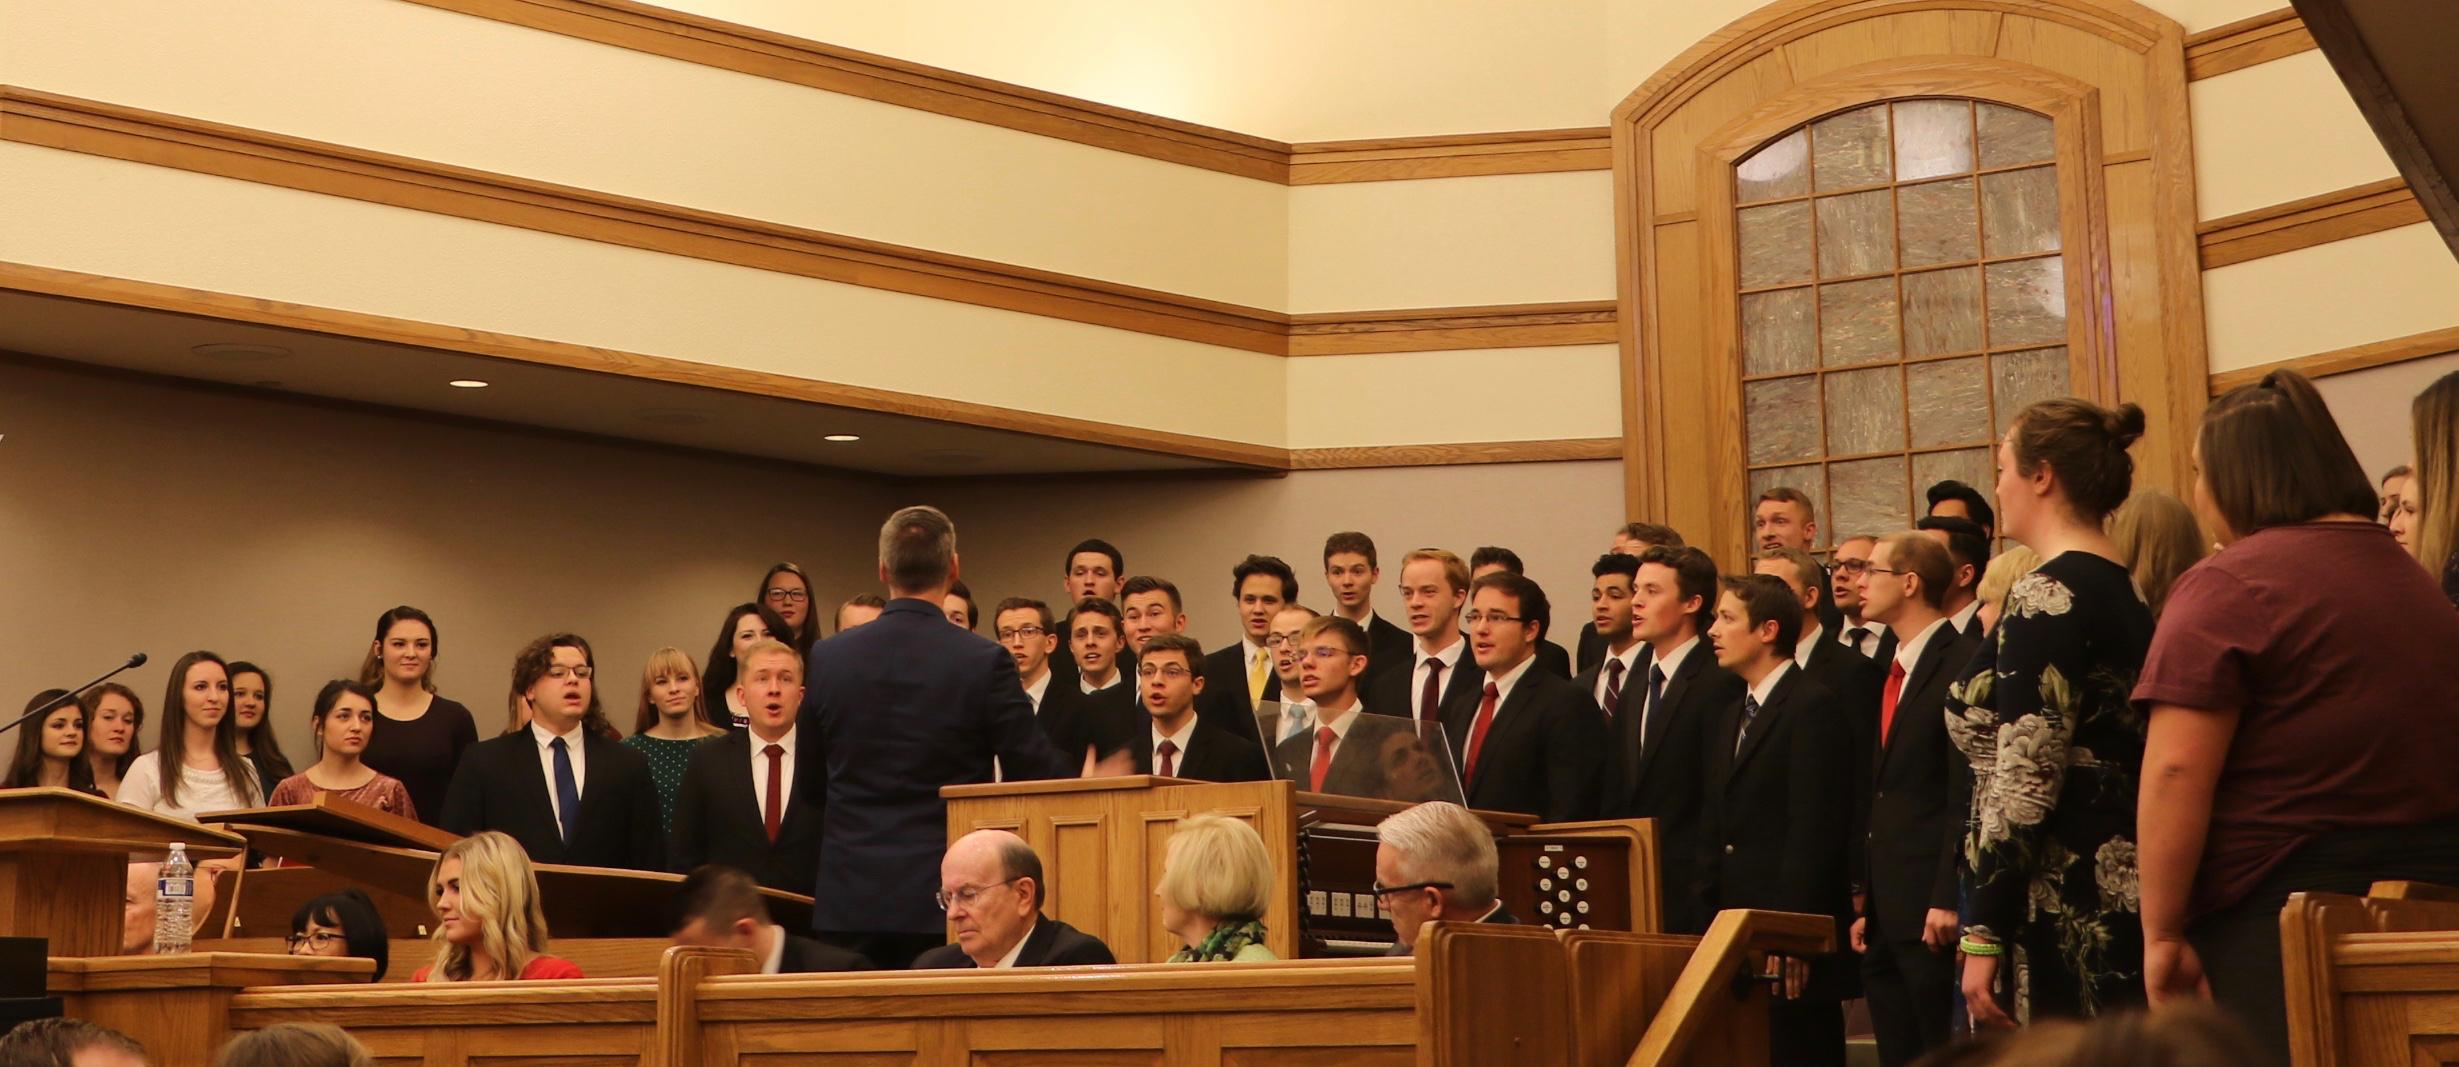 A choir of Utah Valley University students sings at the Utah Valley Institute's Feb. 1, 2019, devotional with Elder Quentin L. Cook of the Quorum of the Twelve Apostles in Orem, Utah.